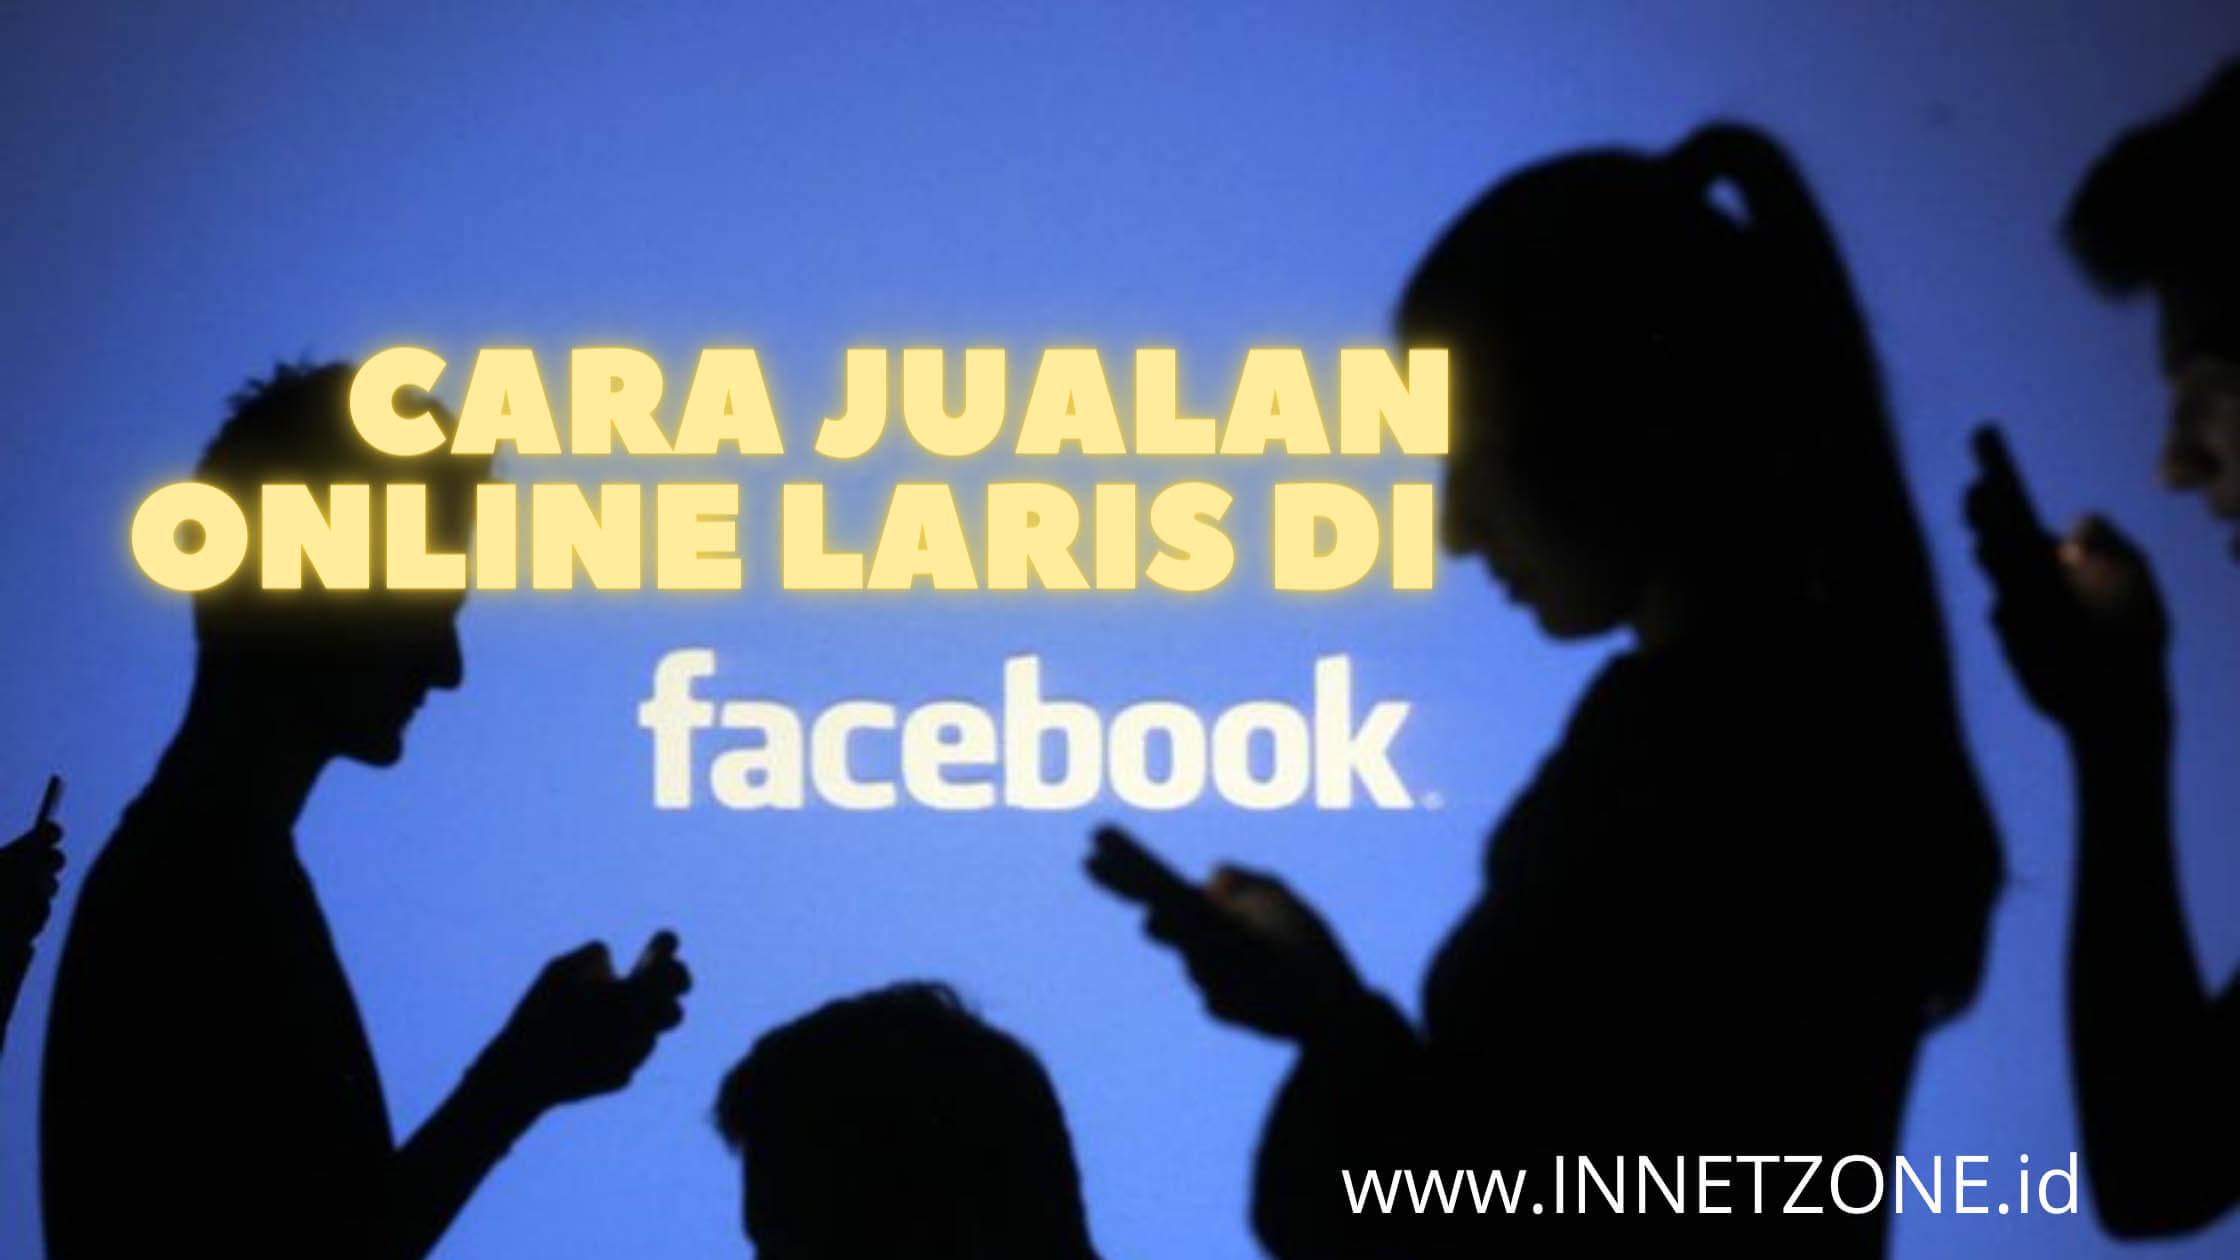 cara jualan online laris di facebook